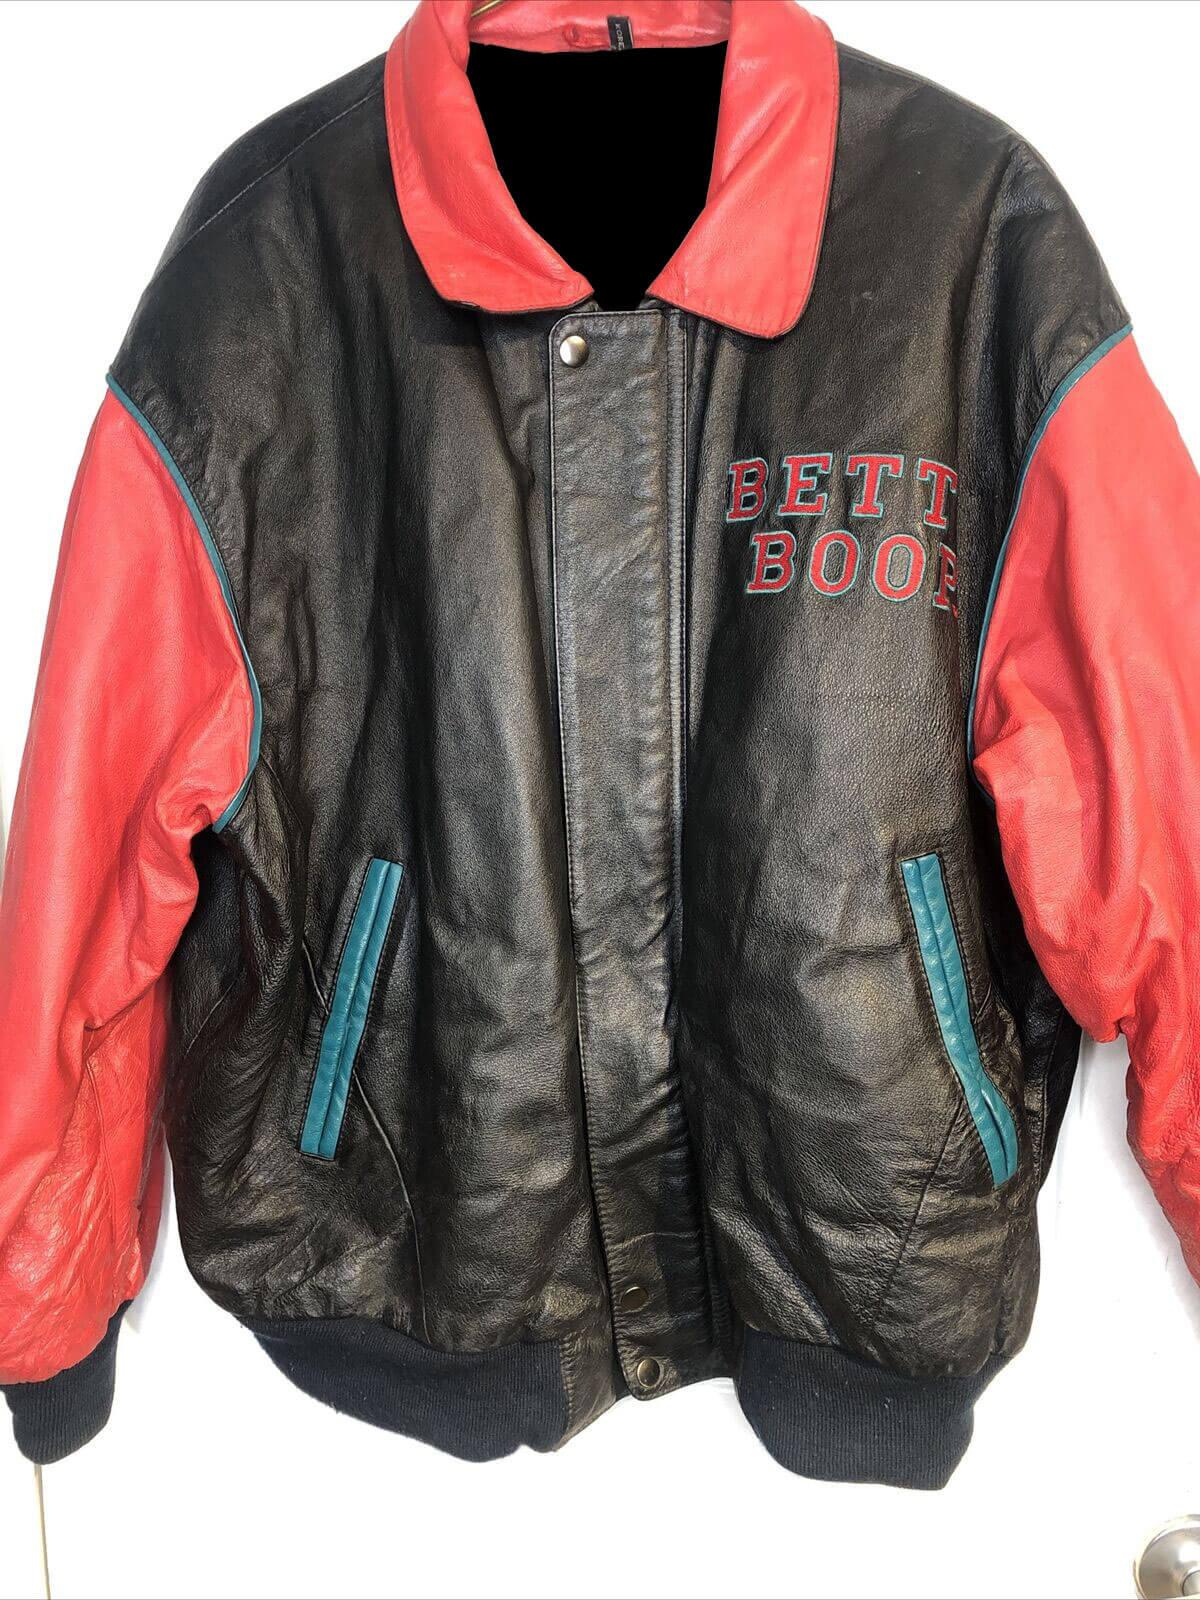 Red Black Betty Boop Vintage Biker Leather Jacket